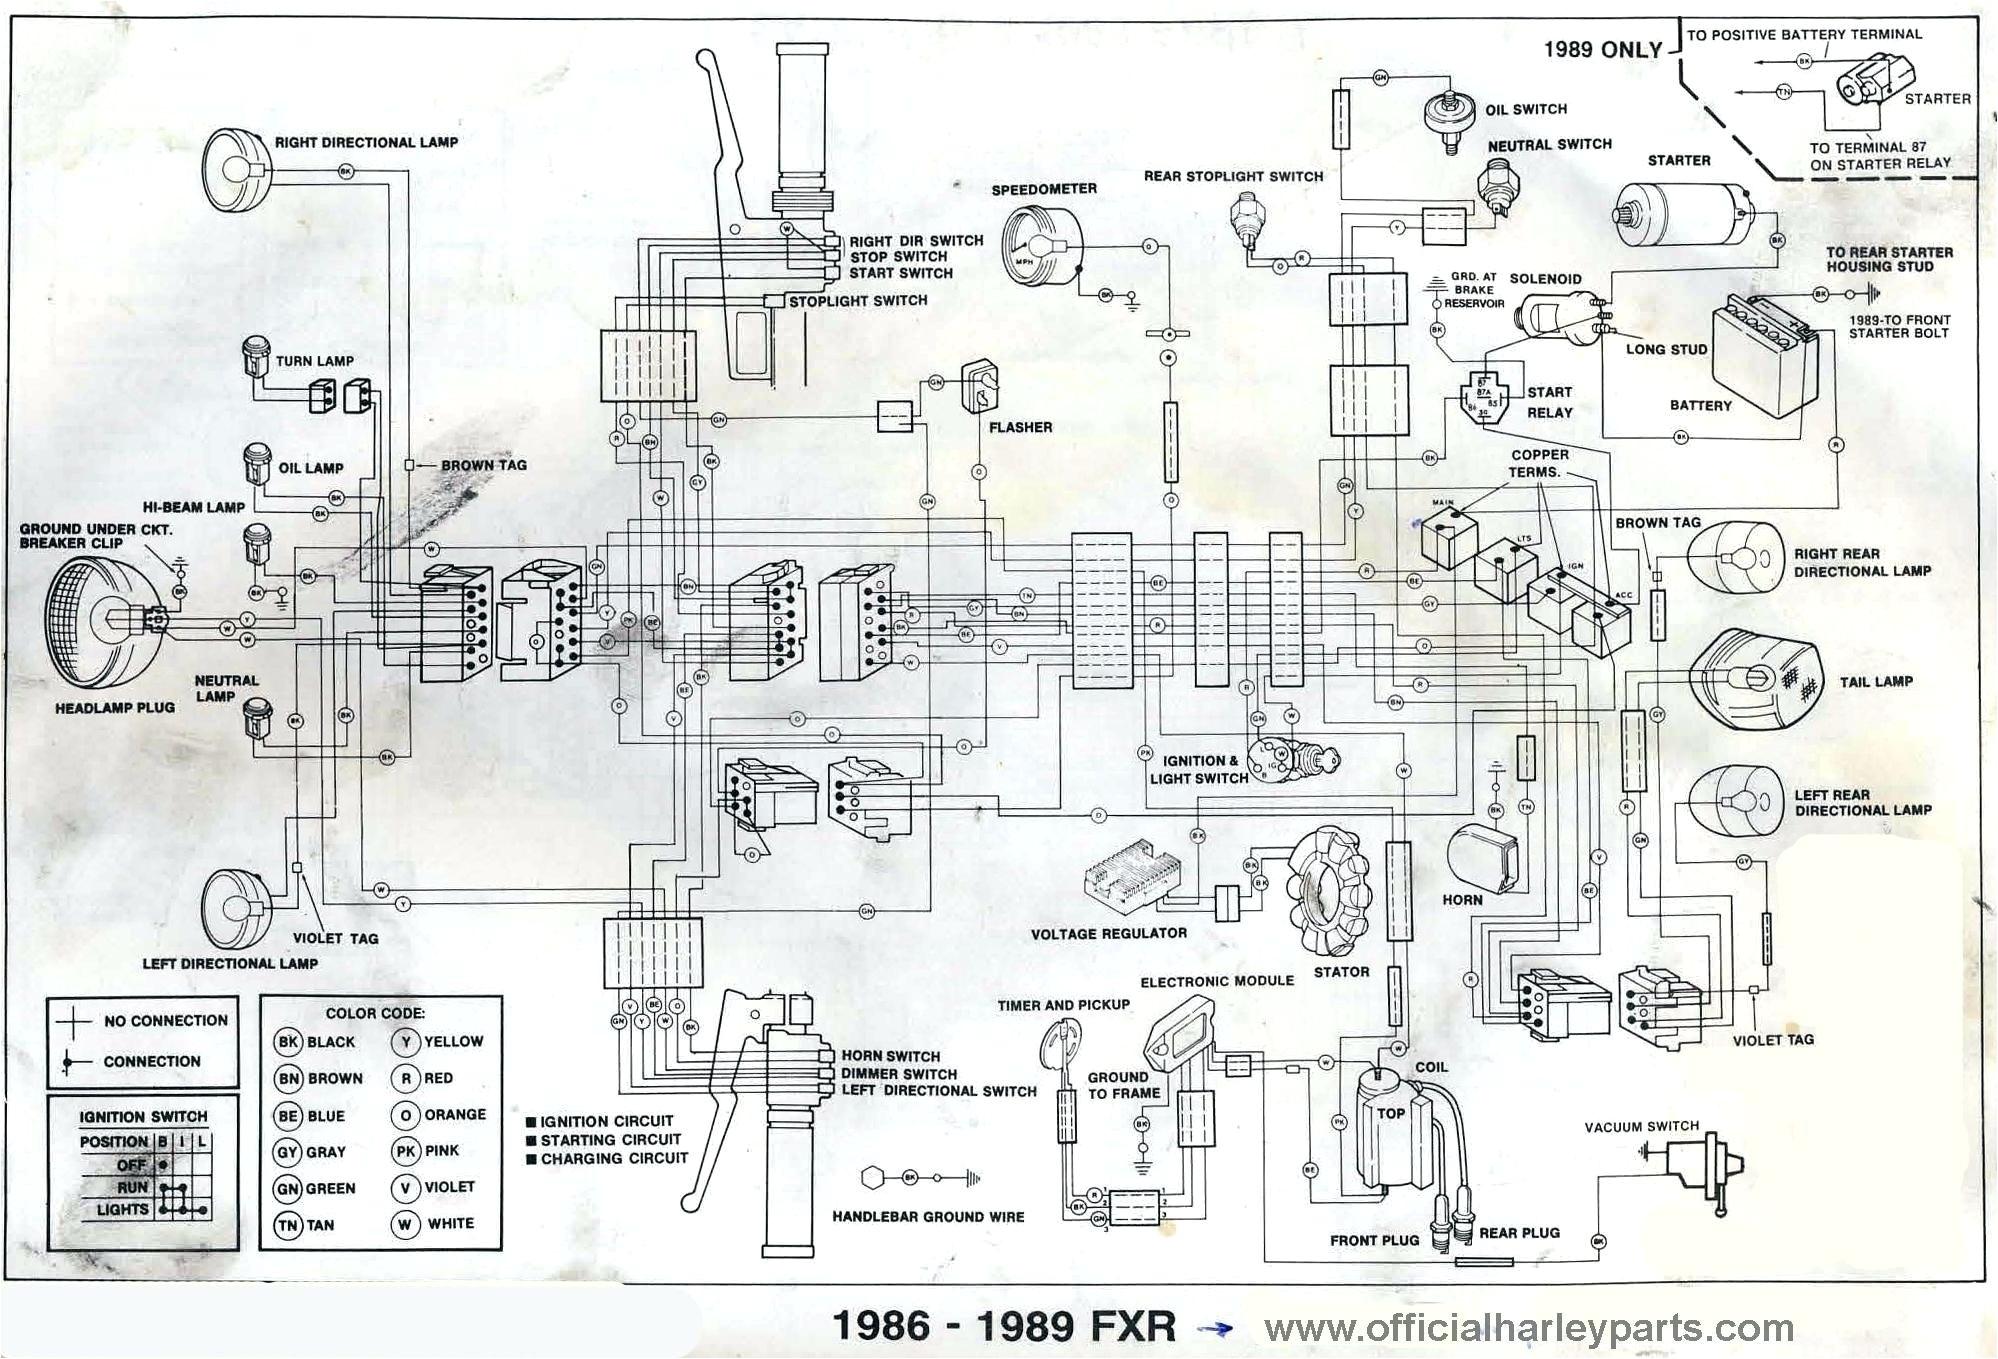 wiring diagram 1980 fxr shovelhead wiring diagram load wiring diagram 1980 fxr shovelhead